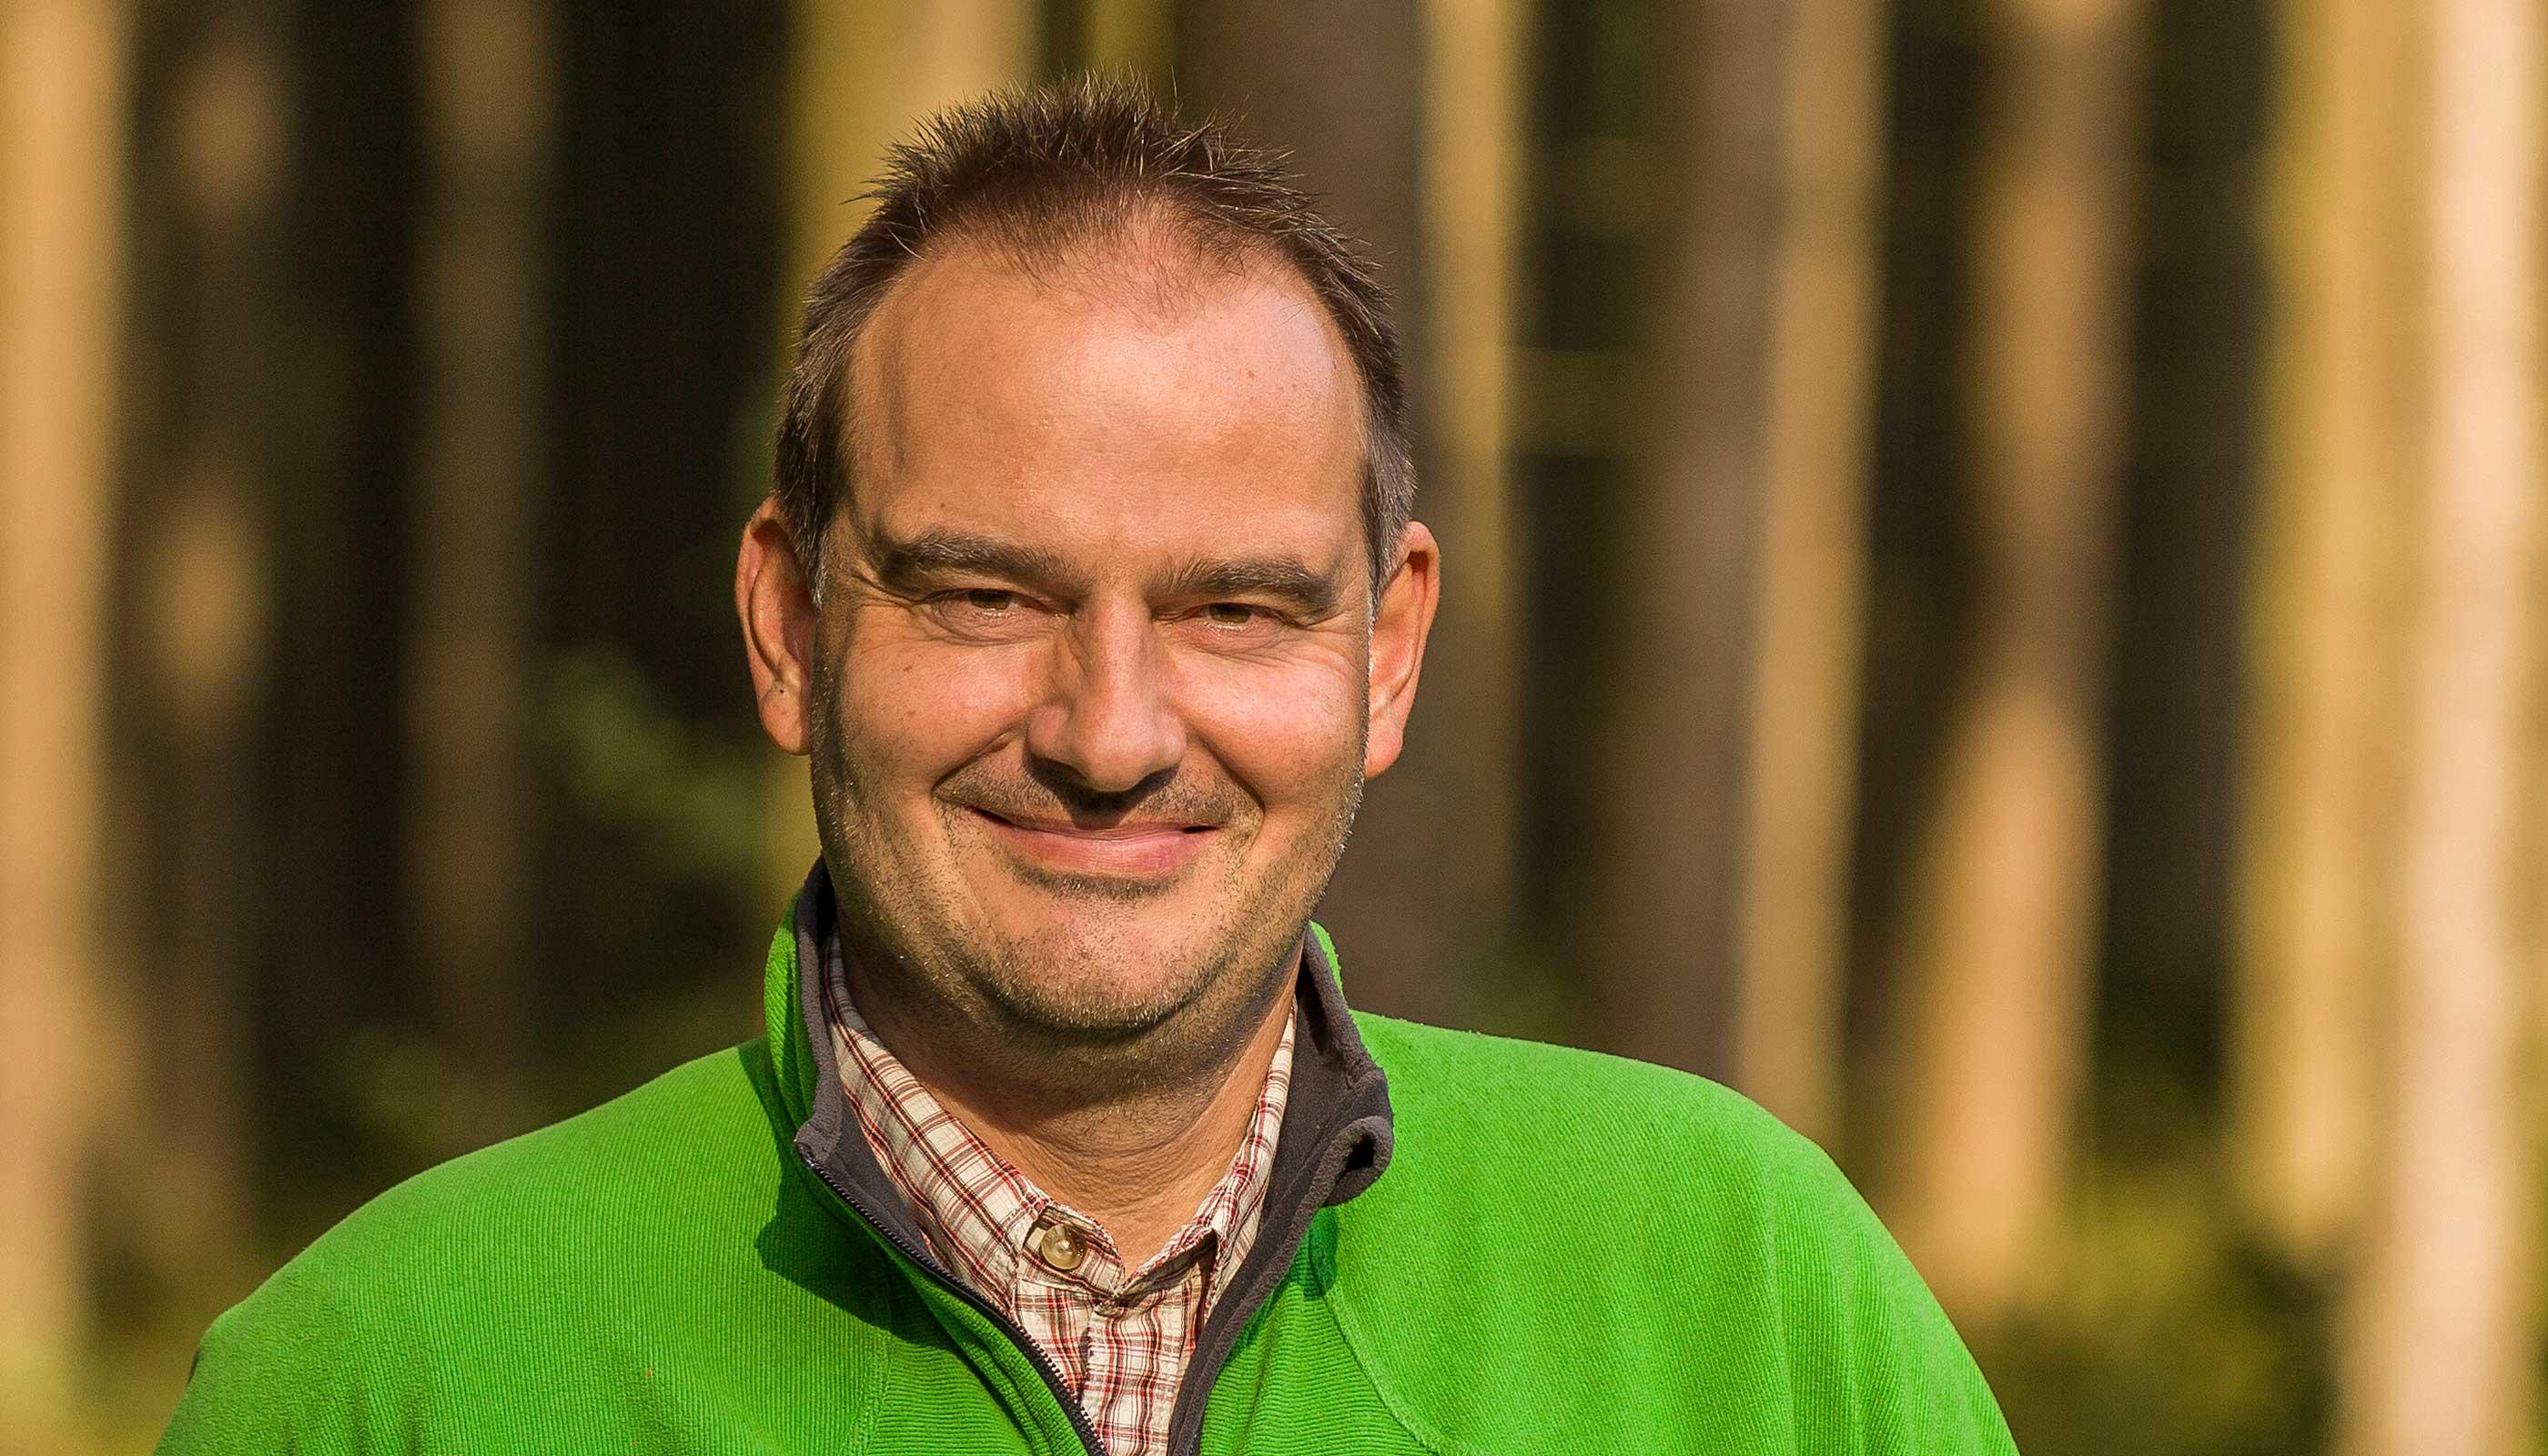 Andreas Schäfer, Dipl.-Forstwirt (Uni)